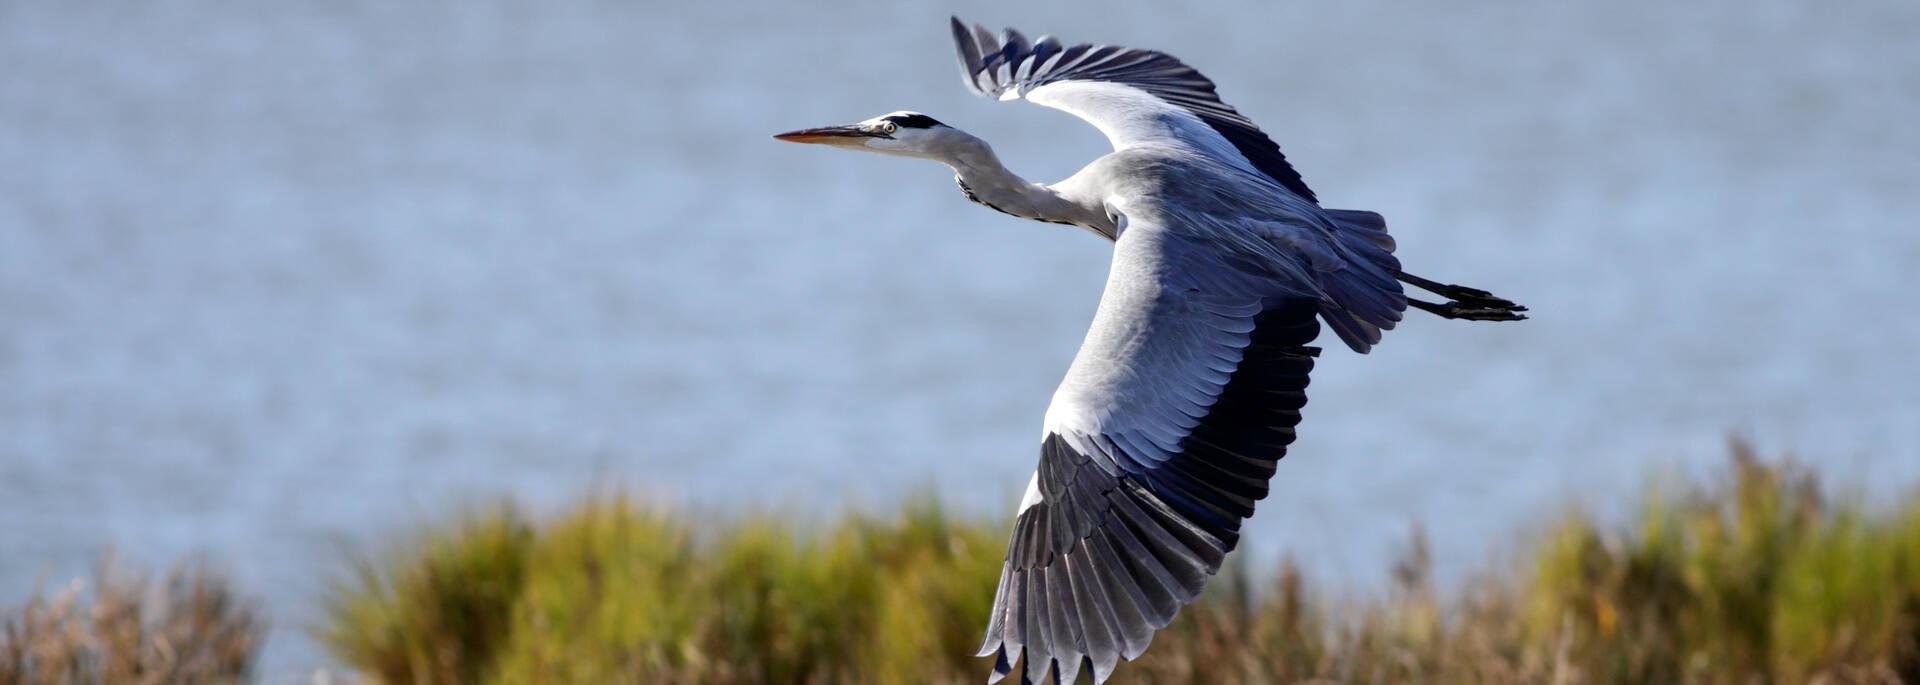 Grey heron, protected species of the League of Protection of Birds - © Zacarias de Mata - Fotolia